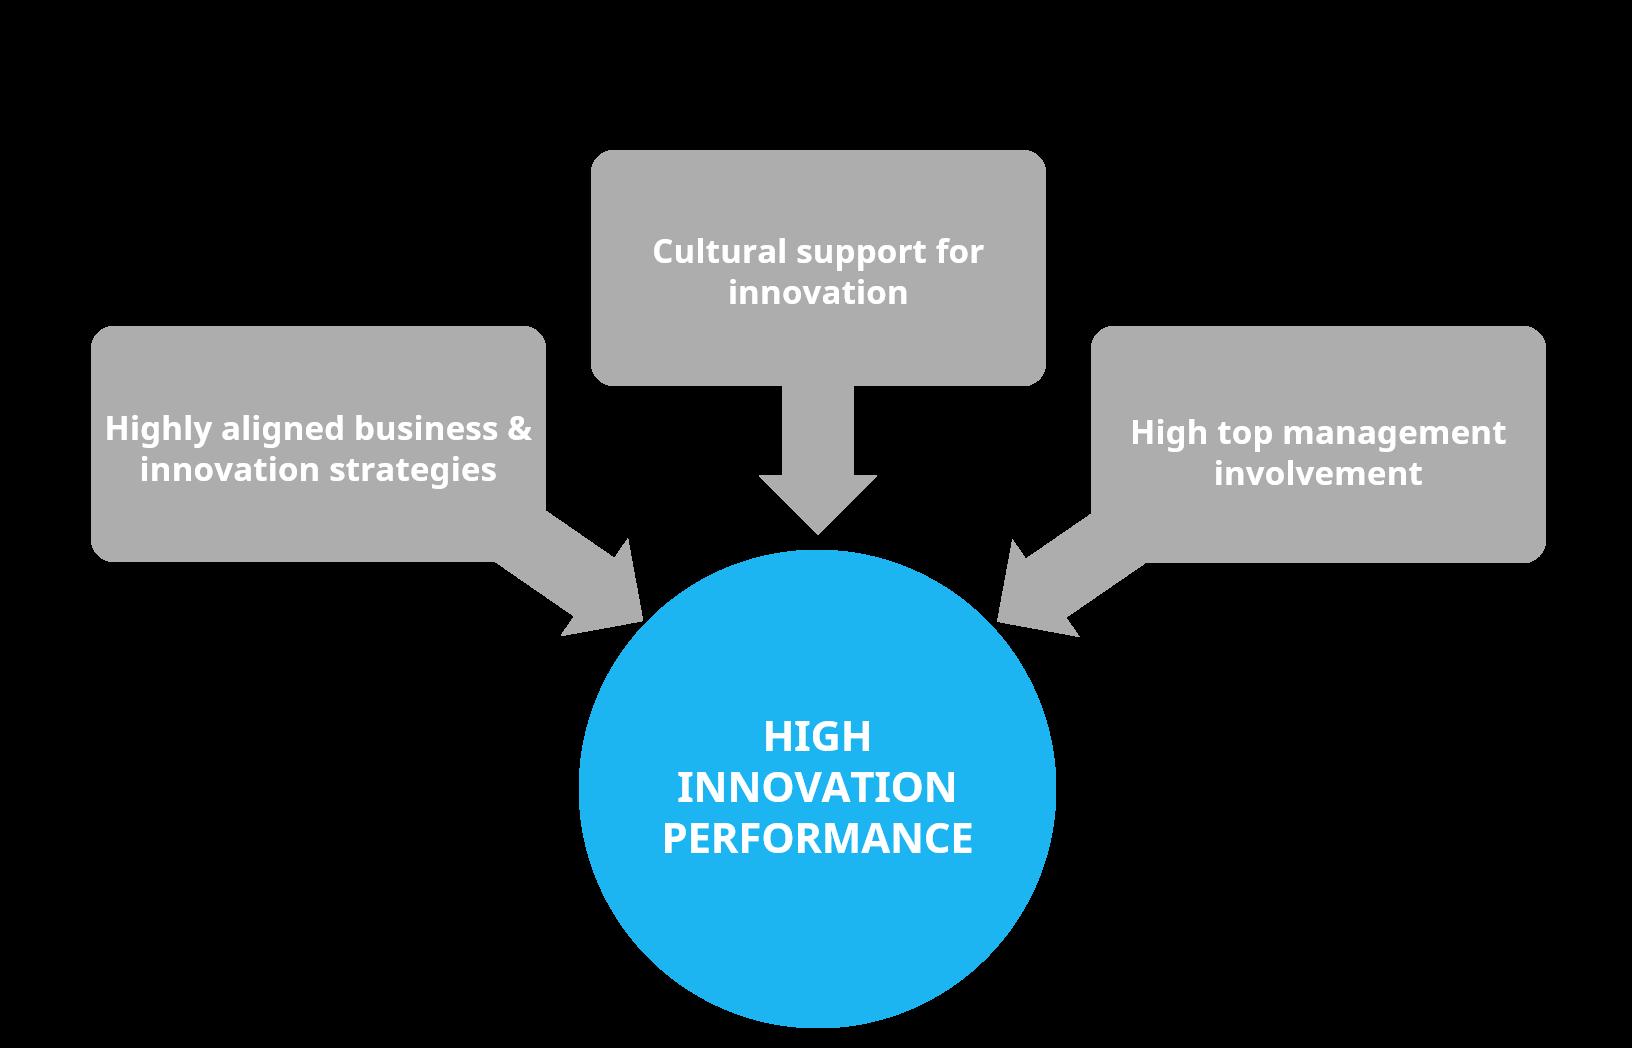 high-innovation-performance